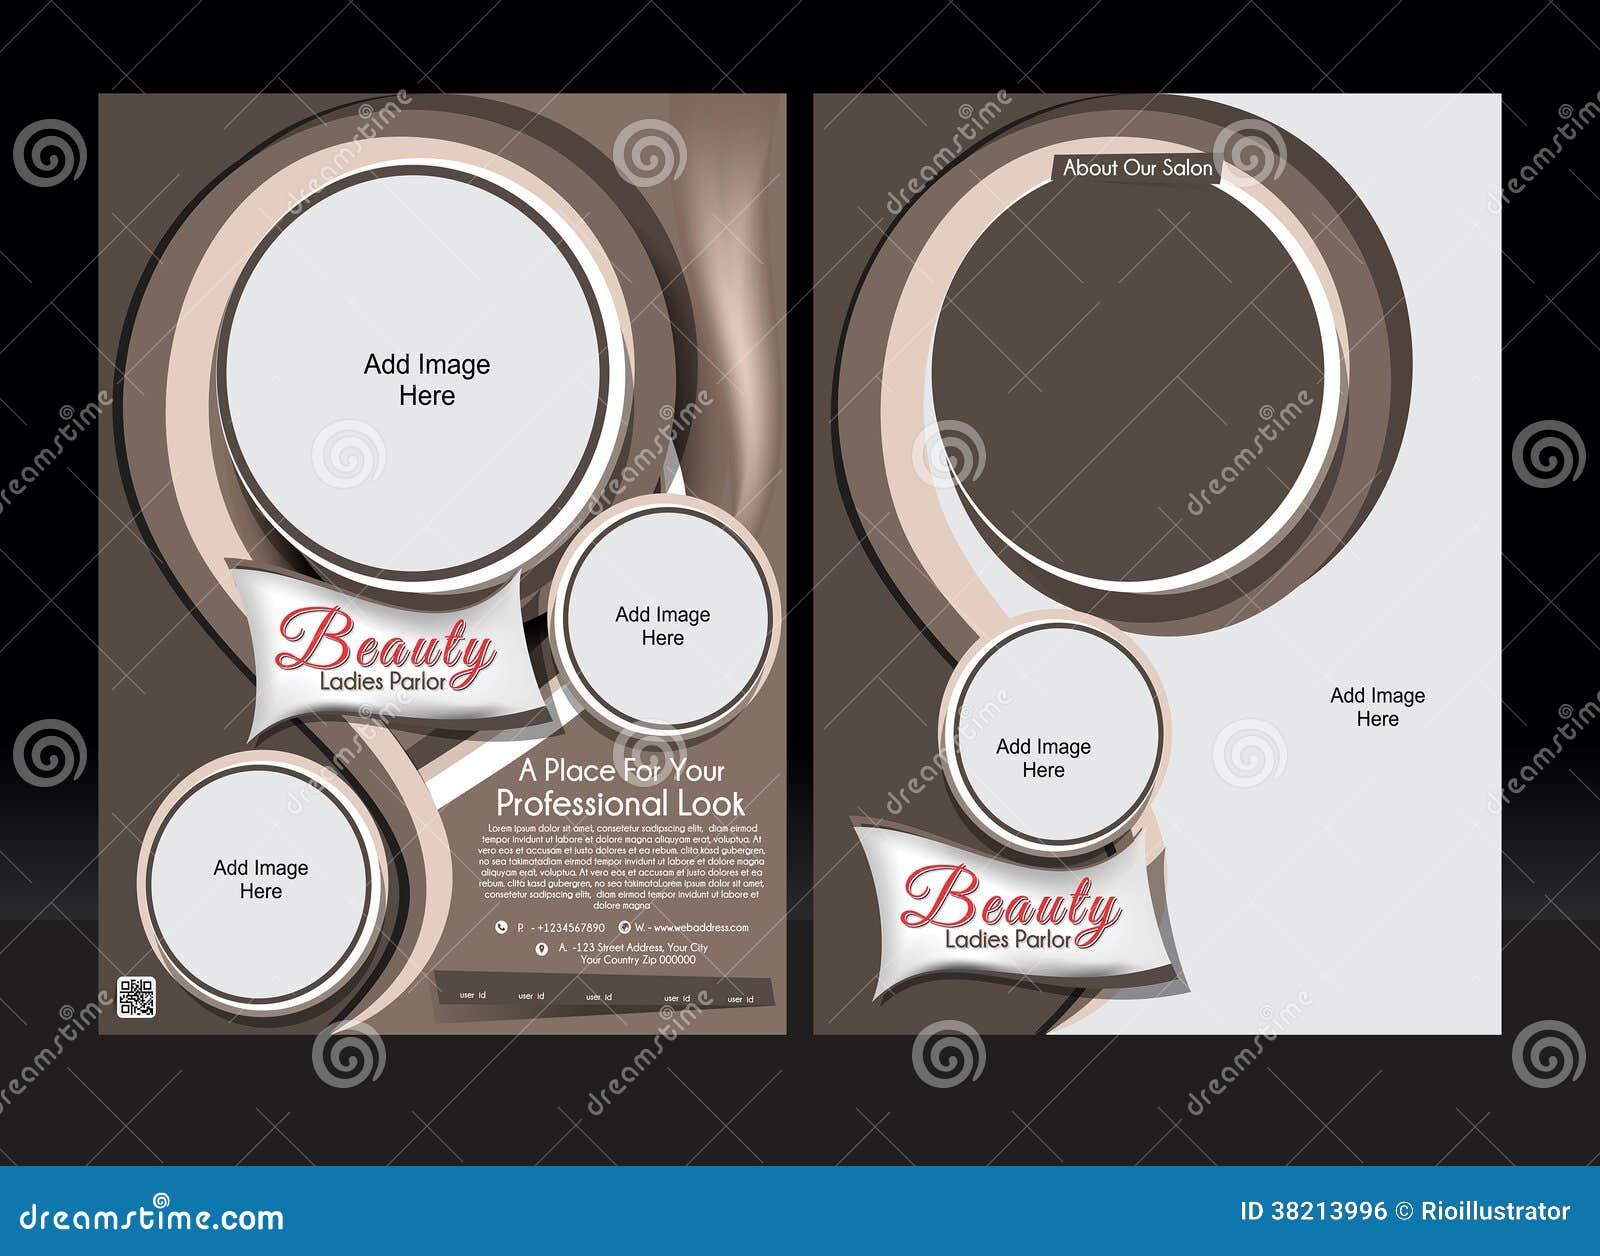 Beauty parlour brochure template - 35+ free jpg, psd, indesign